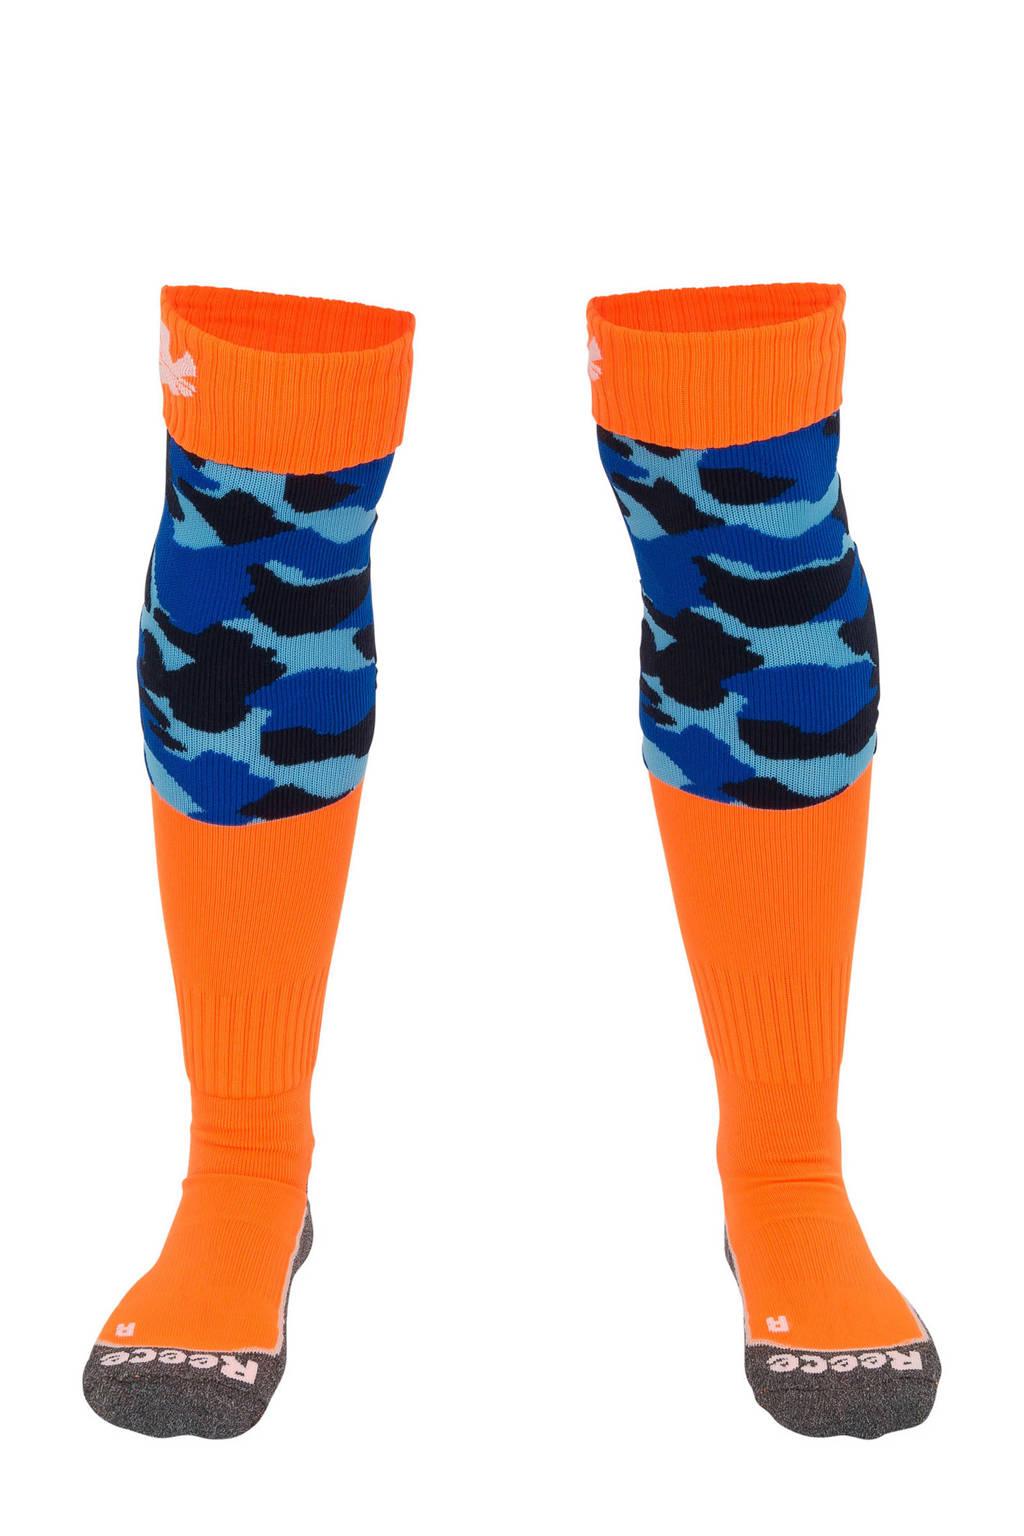 Reece Australia   hockeysokken, Oranje/lichtblauw/blauw/zwart